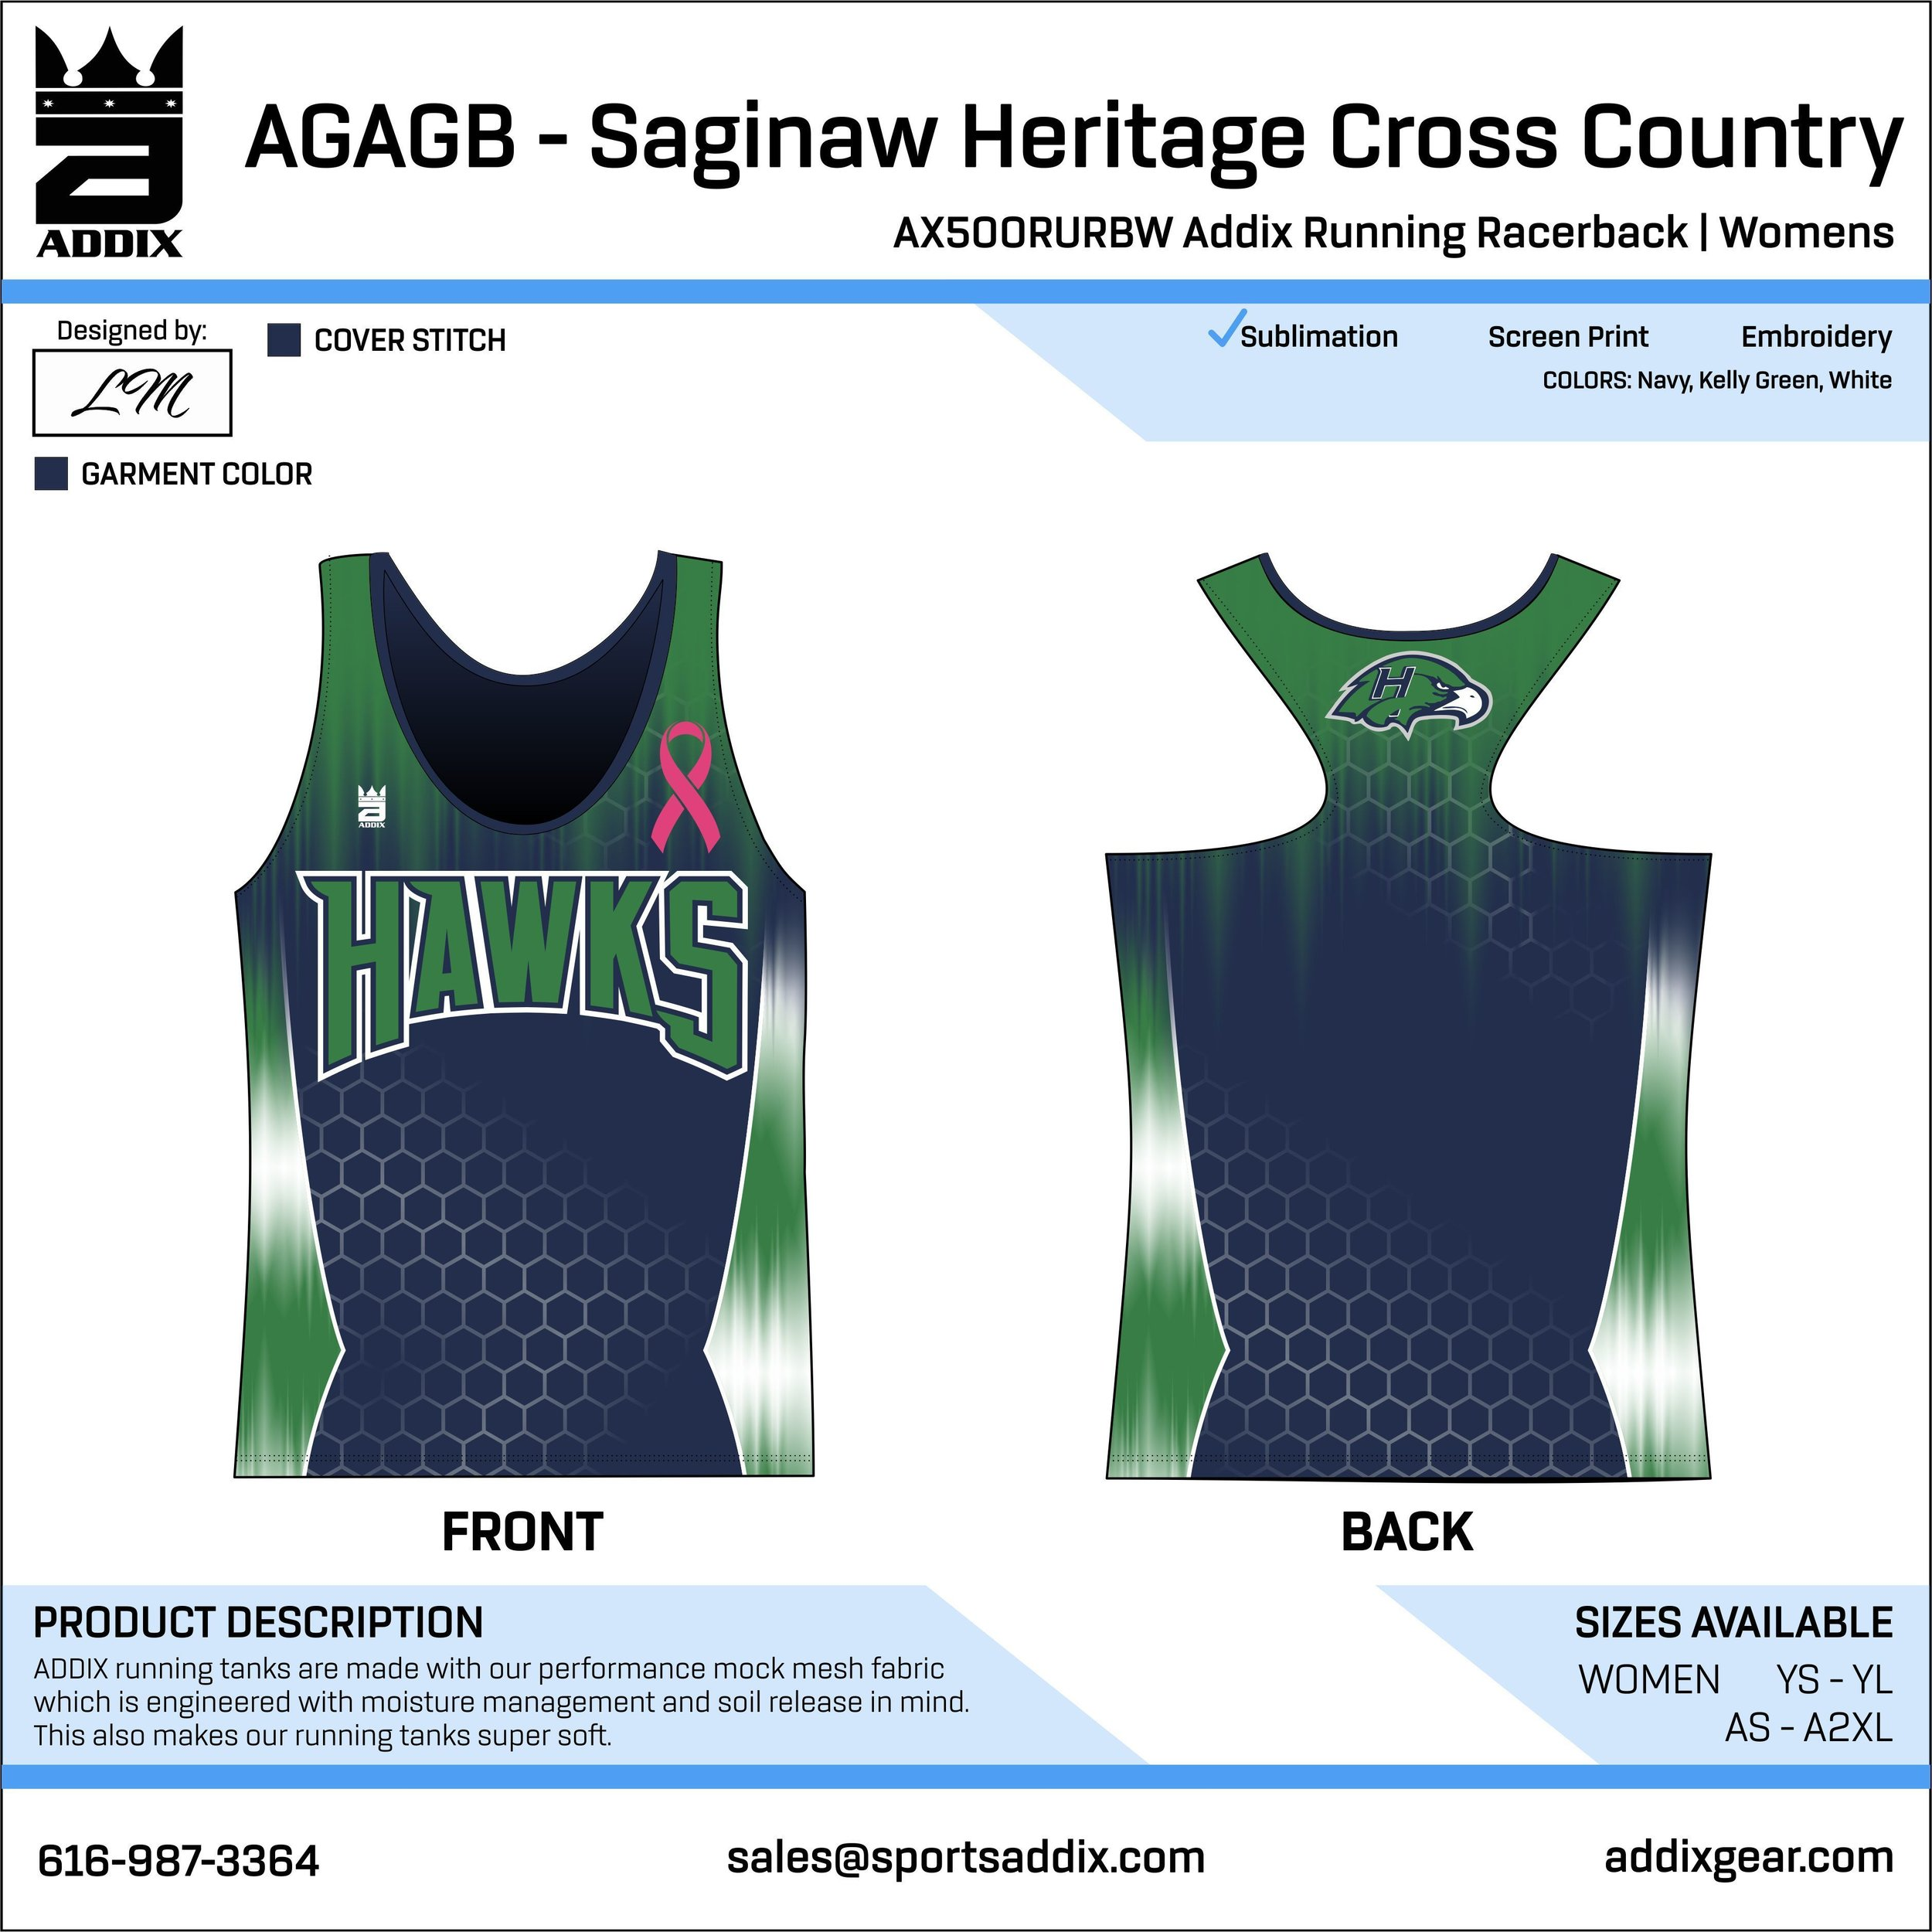 AGAGB - Saginaw Heritage Cross Country_2018_6-13_LM_womens racerback_1.jpg